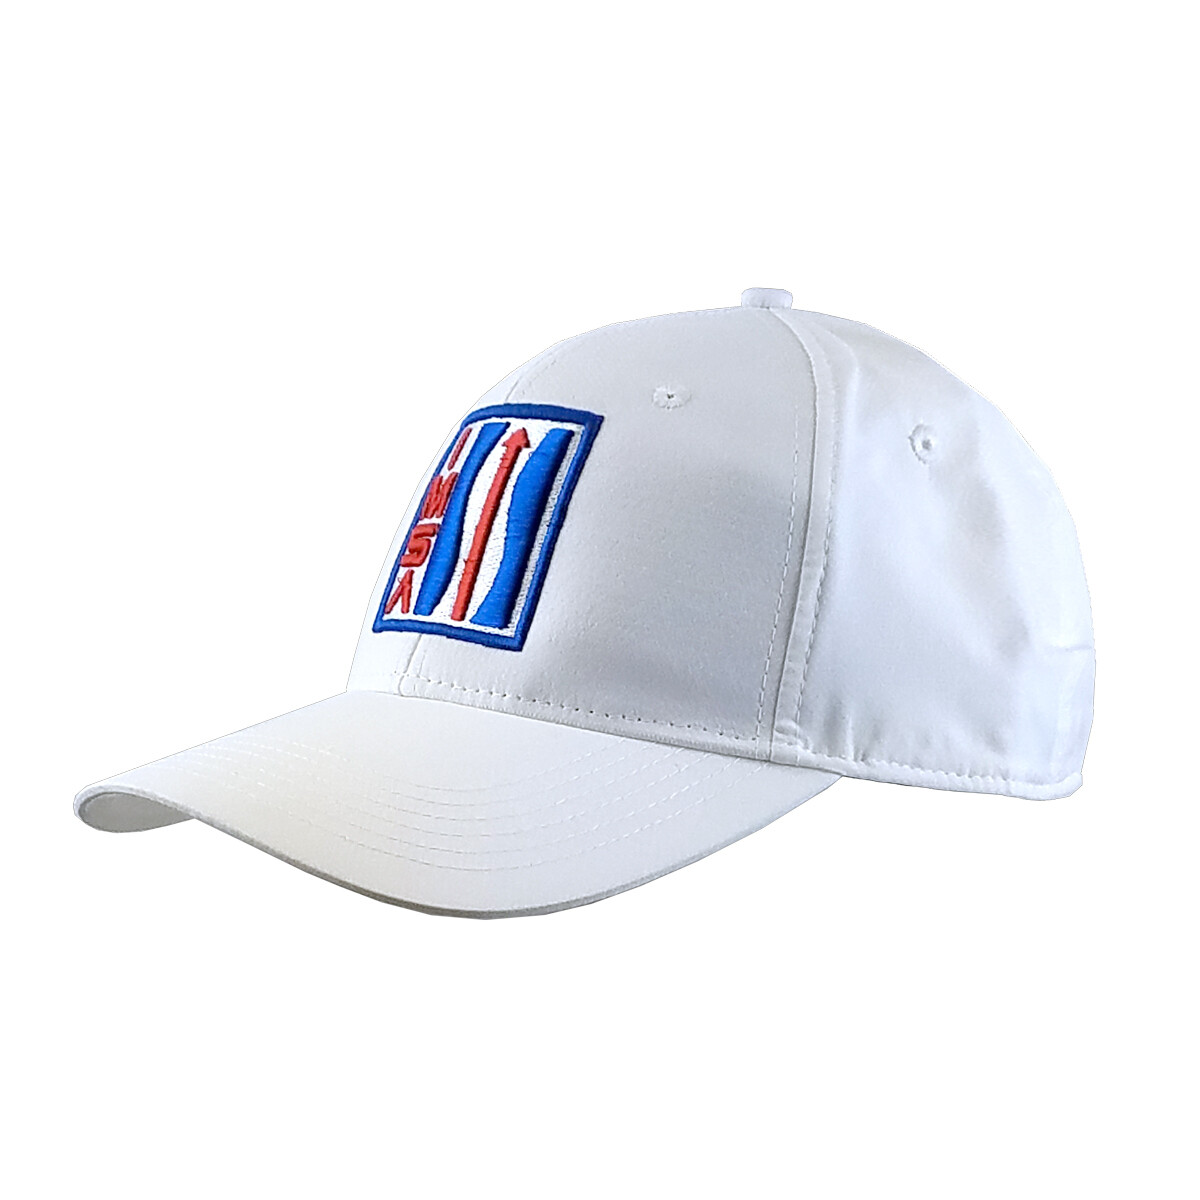 IMSA Vintage Logo Cap -White